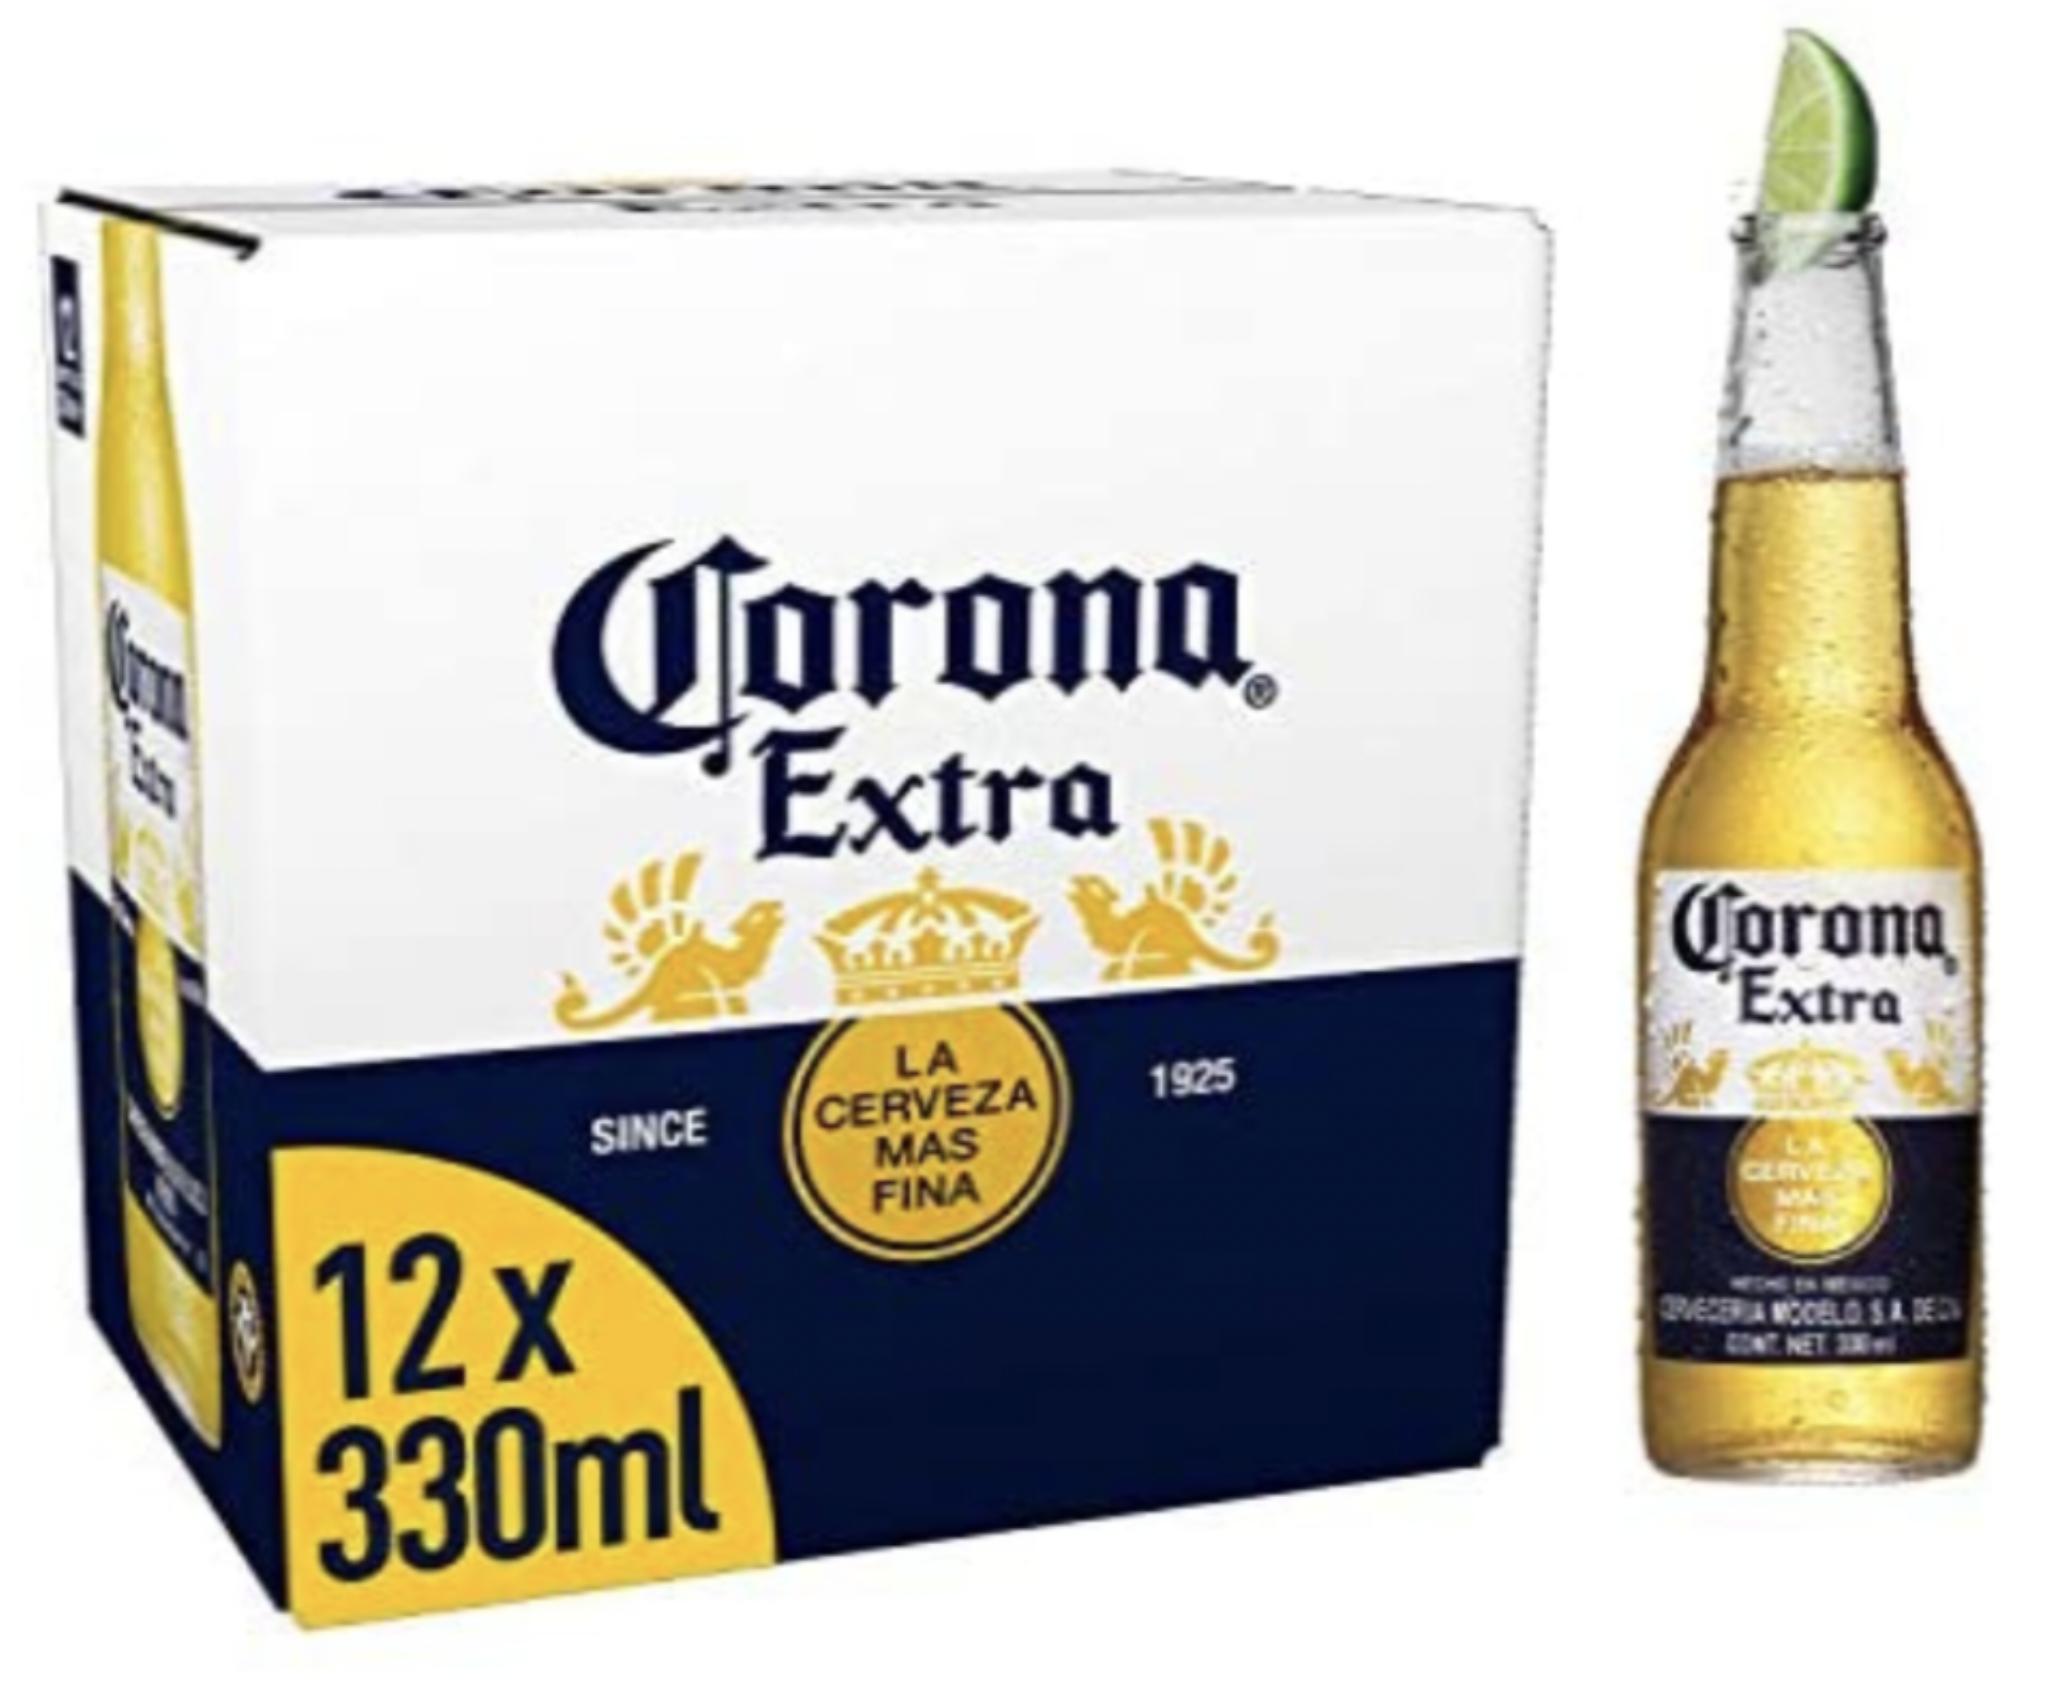 Corona Extra Premium Lager Beer Bottles 12x330ml £9 @ Asda